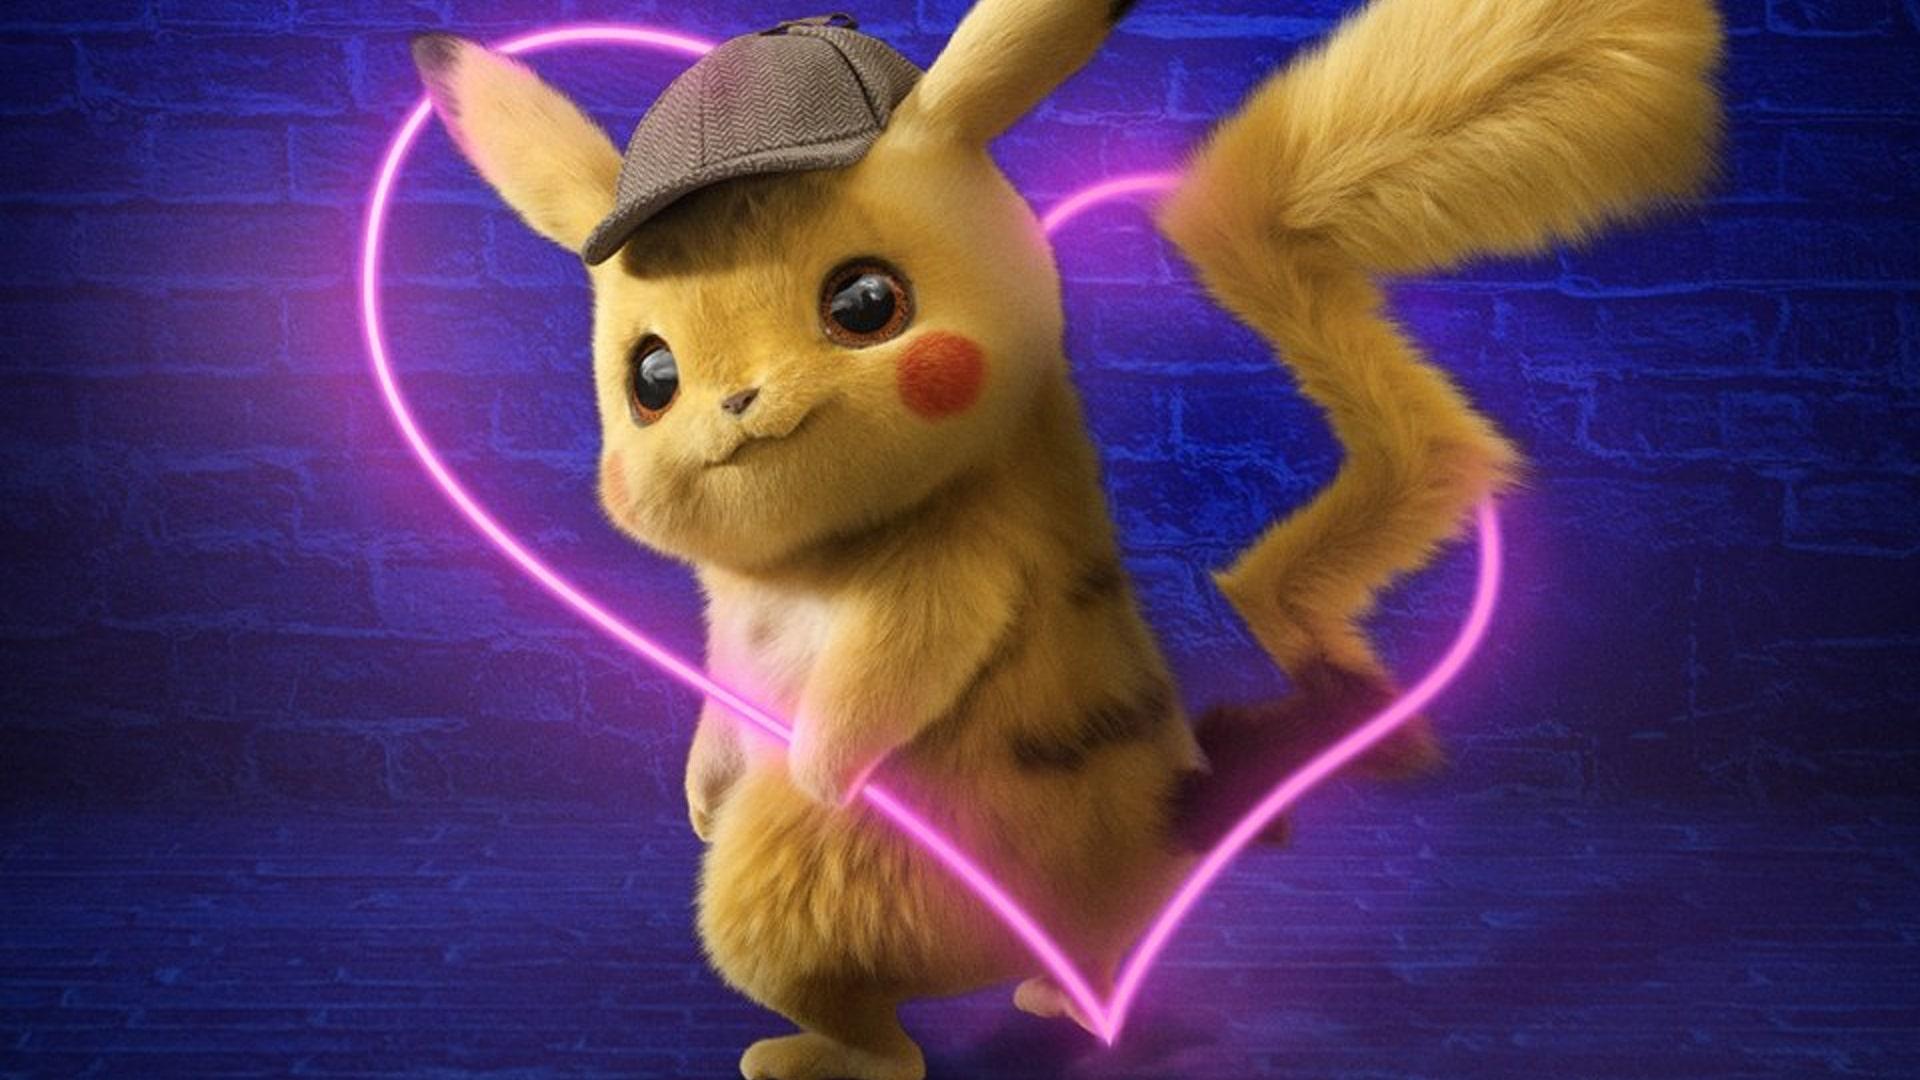 Pokémon Detective Pikachu Hd Wallpapers 7wallpapersnet